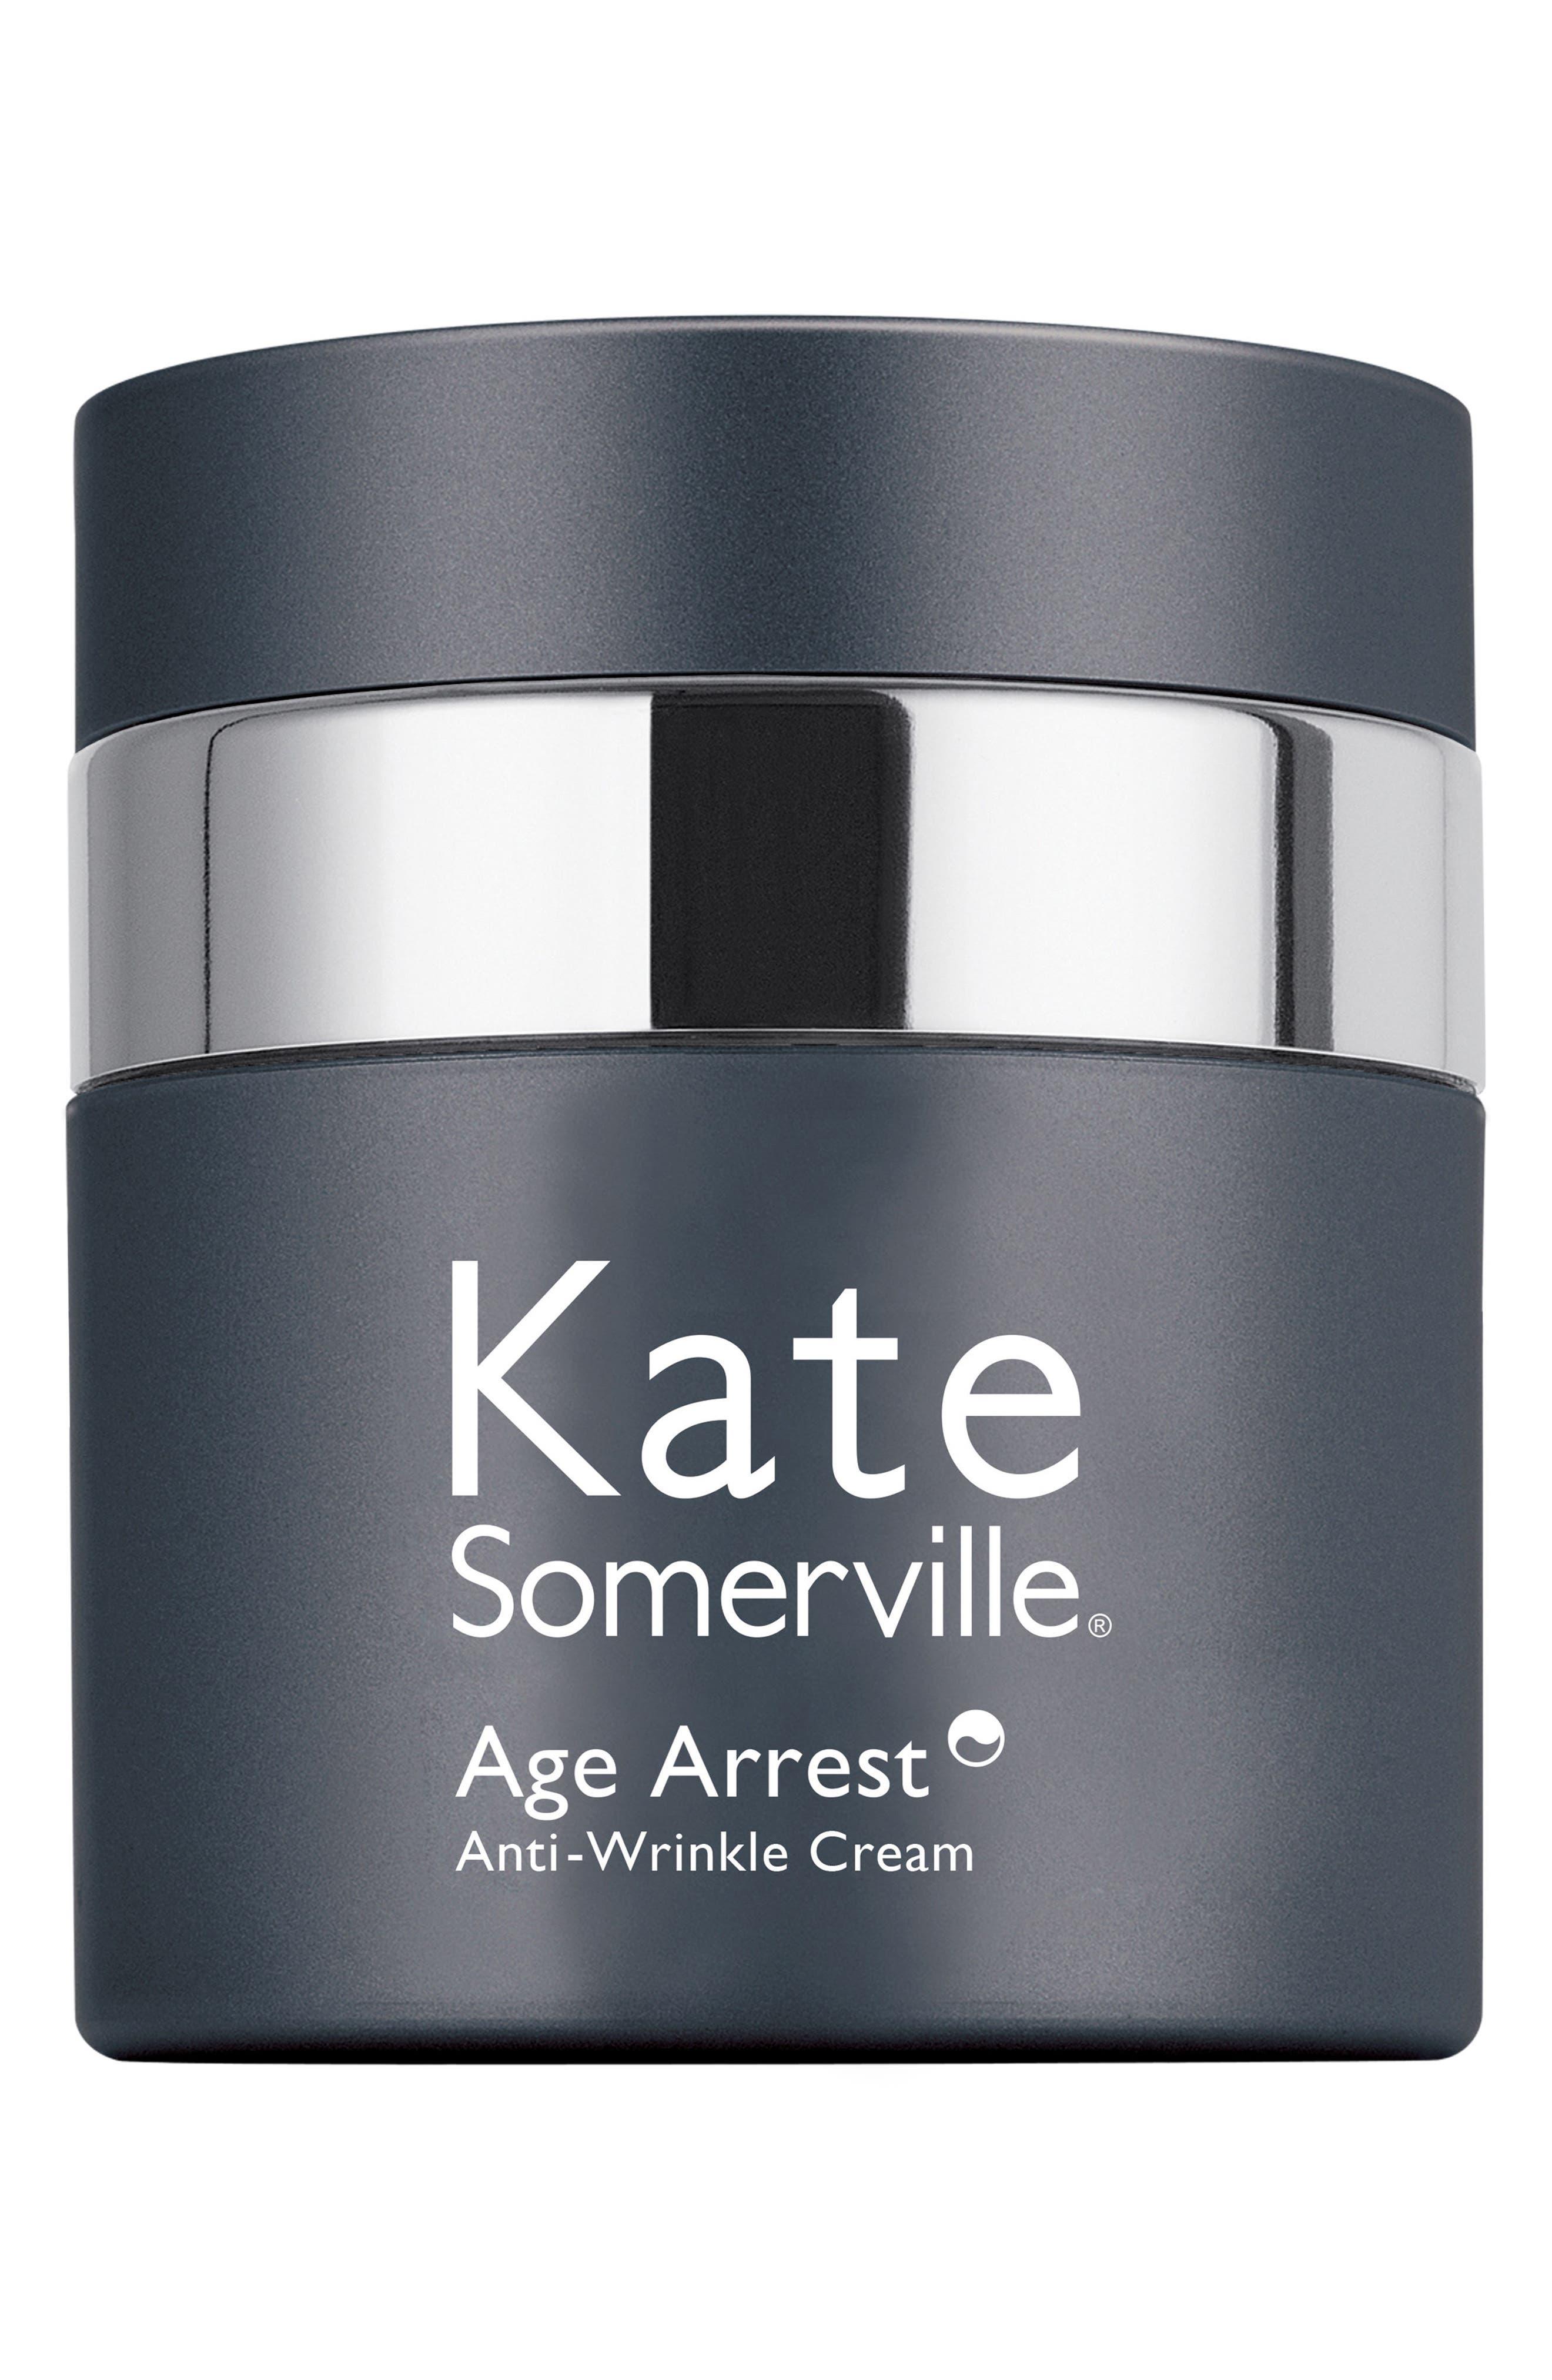 Alternate Image 1 Selected - Kate Somerville® 'Age Arrest' Wrinkle Reducing Cream